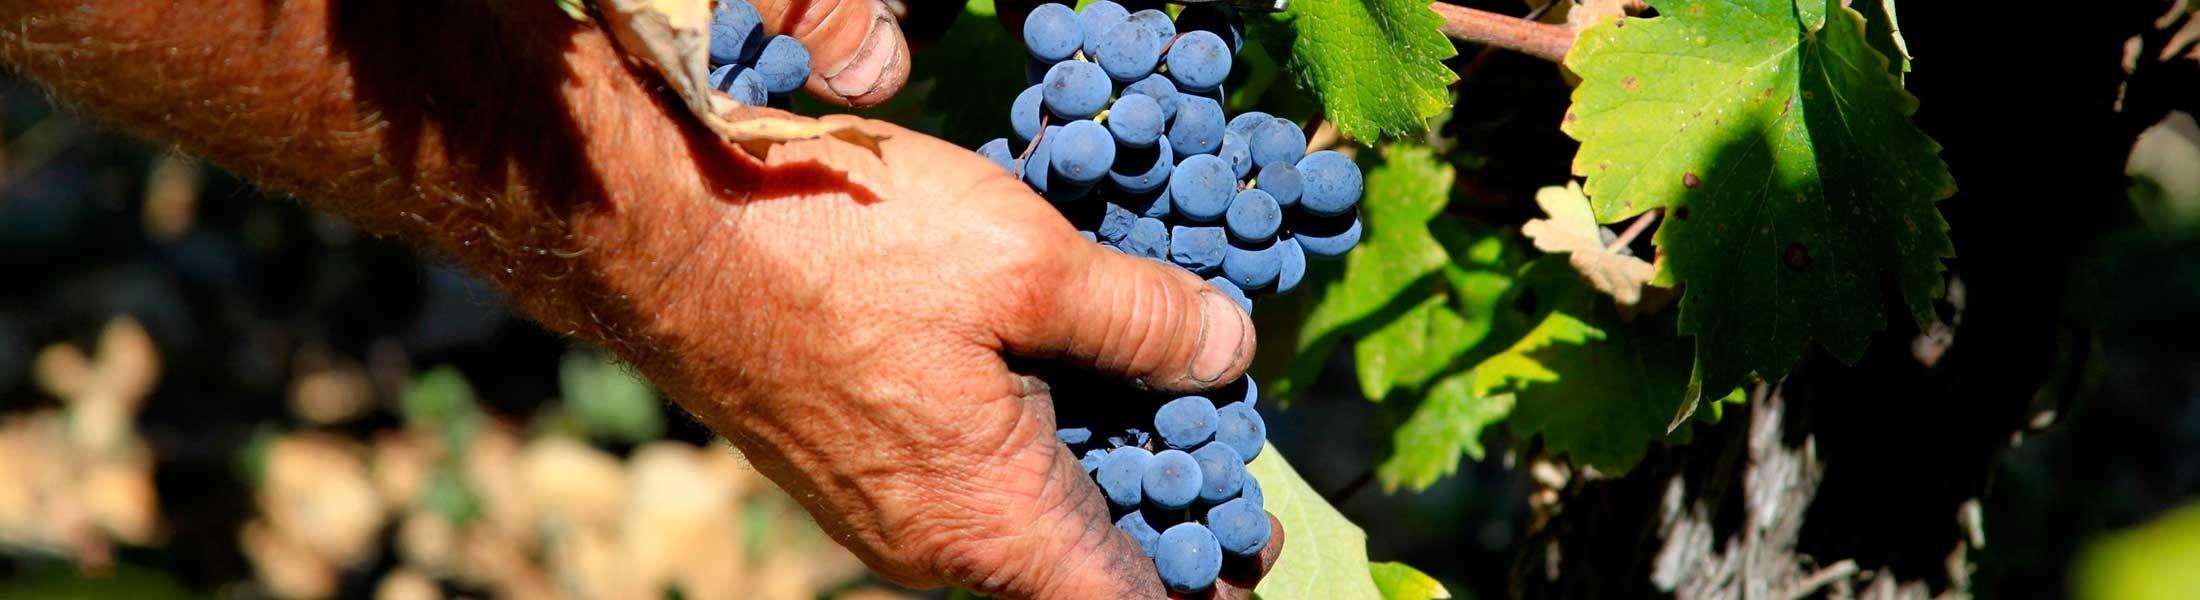 Photo gros plan - vignoble - raisins - grappe - vin - empreinte des hommes - main - vigneron